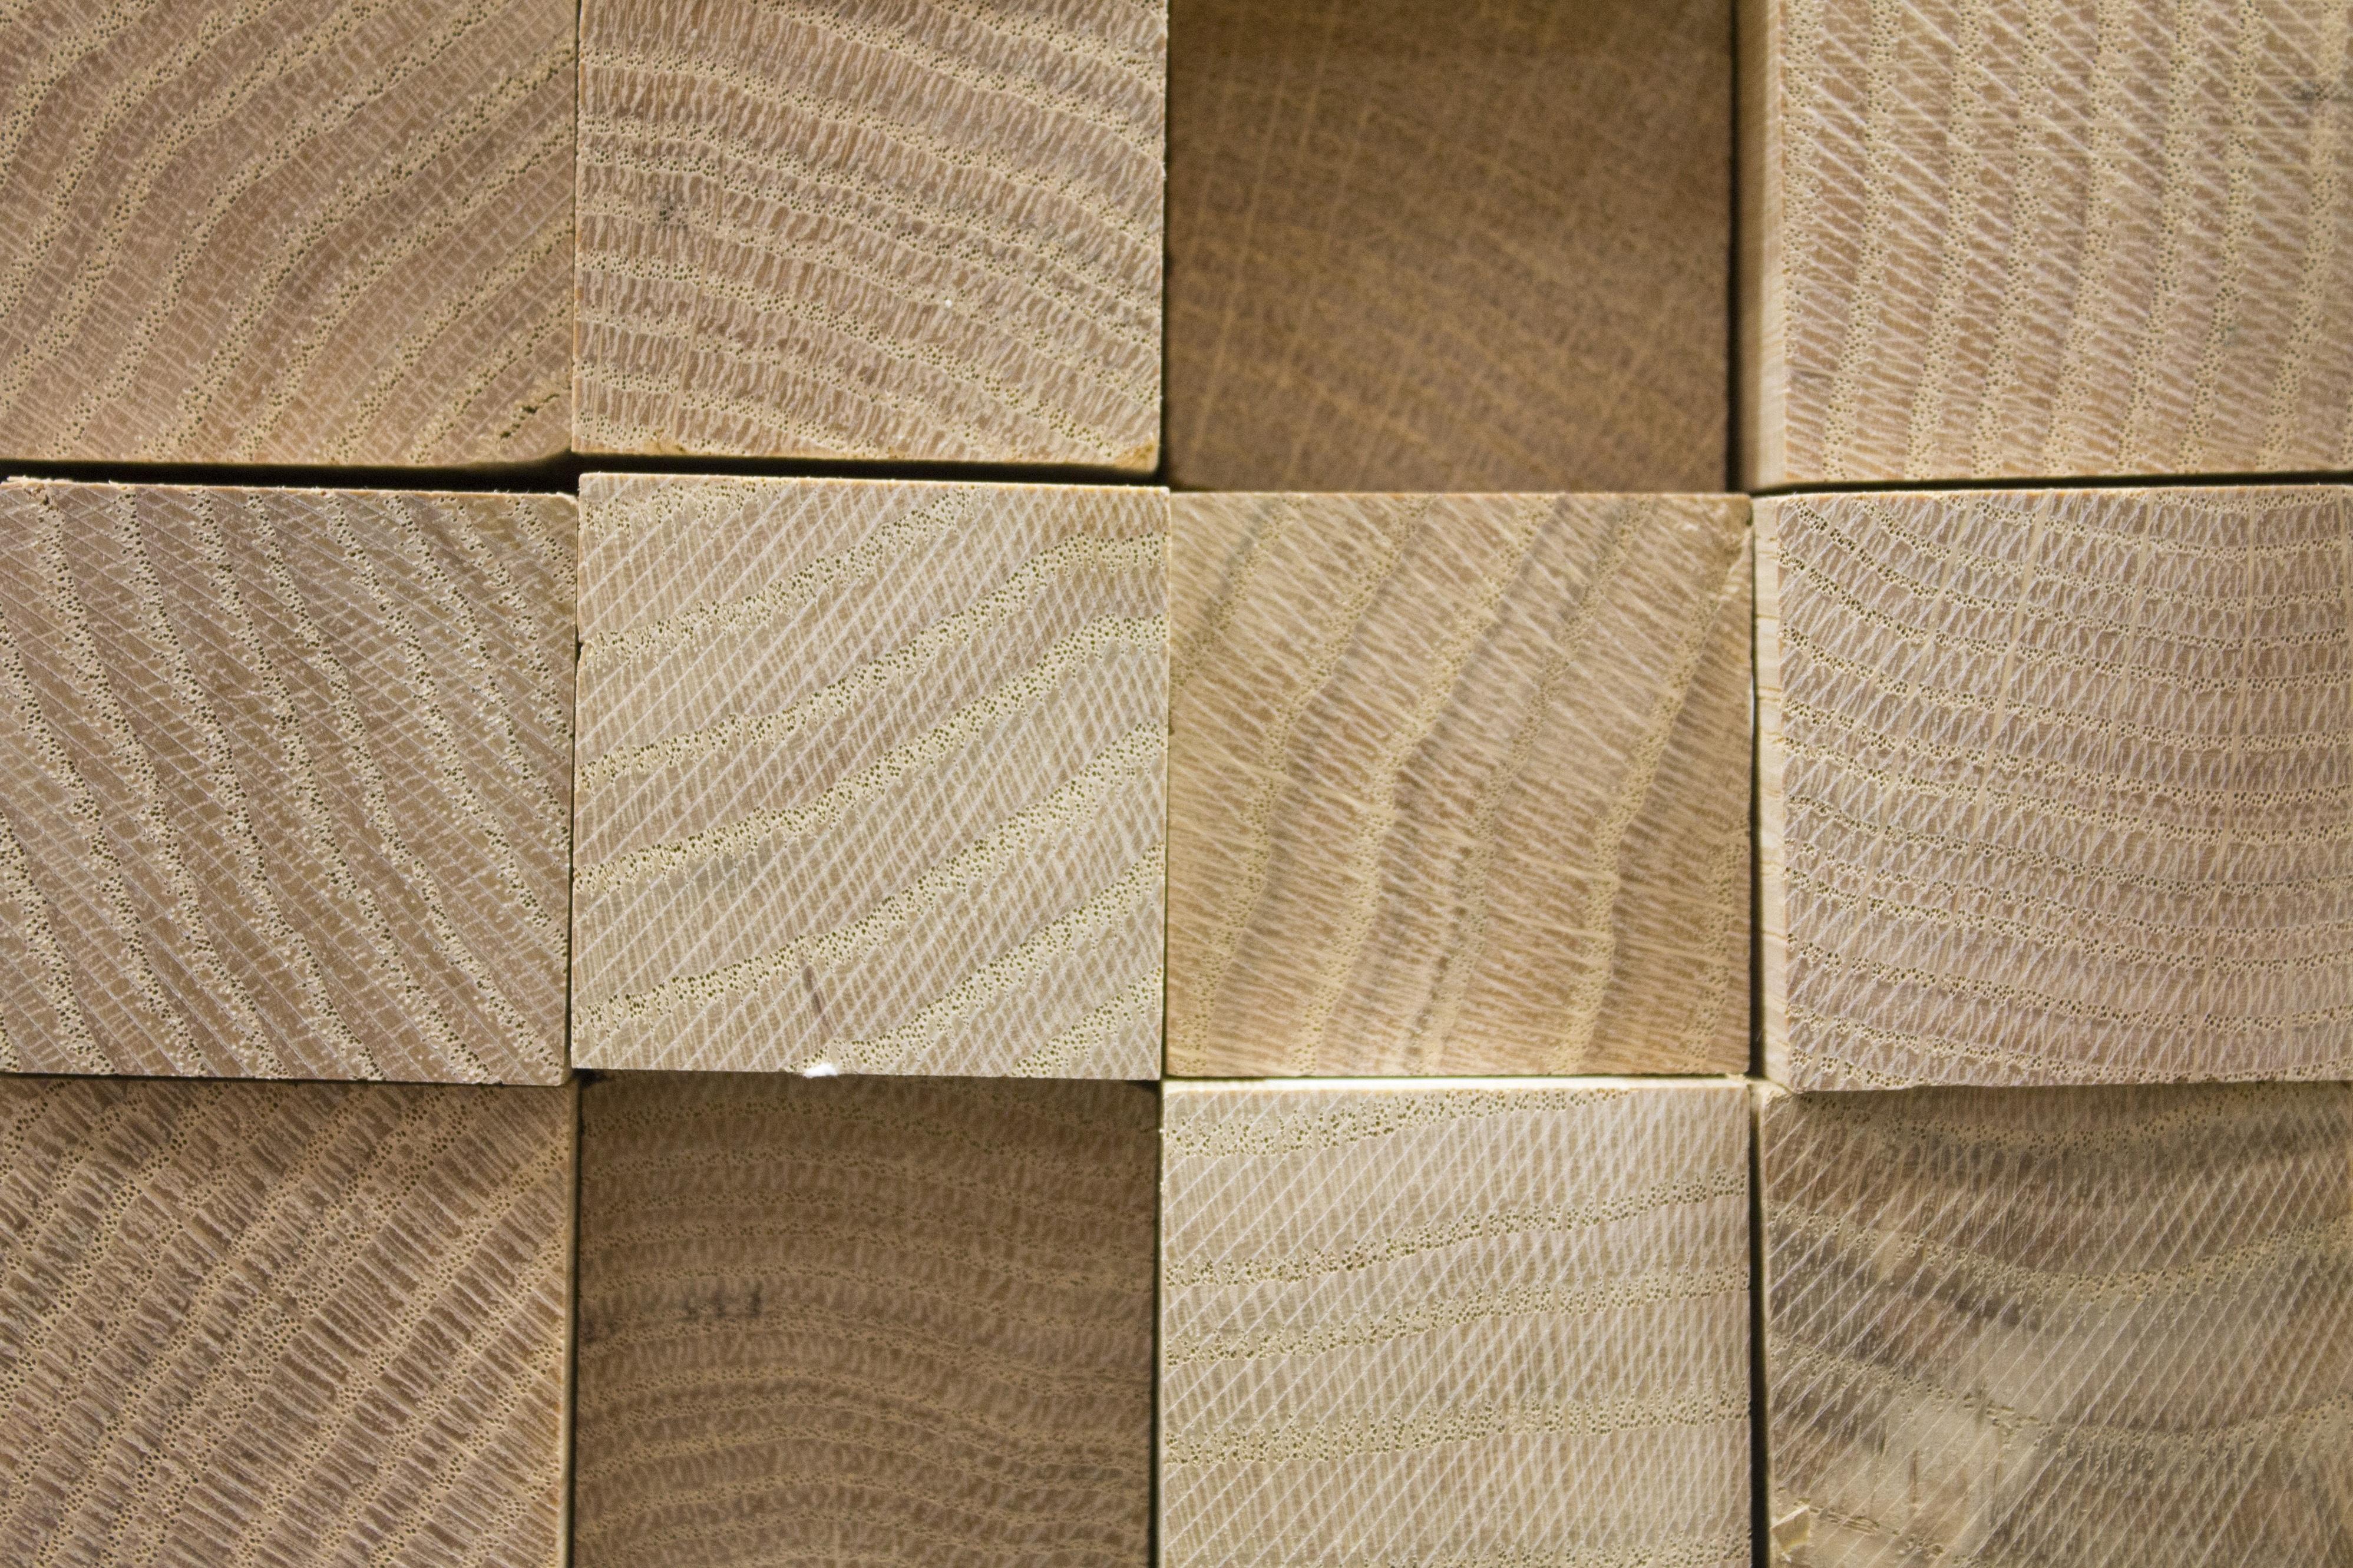 Fotos gratis : estructura, grano, textura, tablón, piso ...